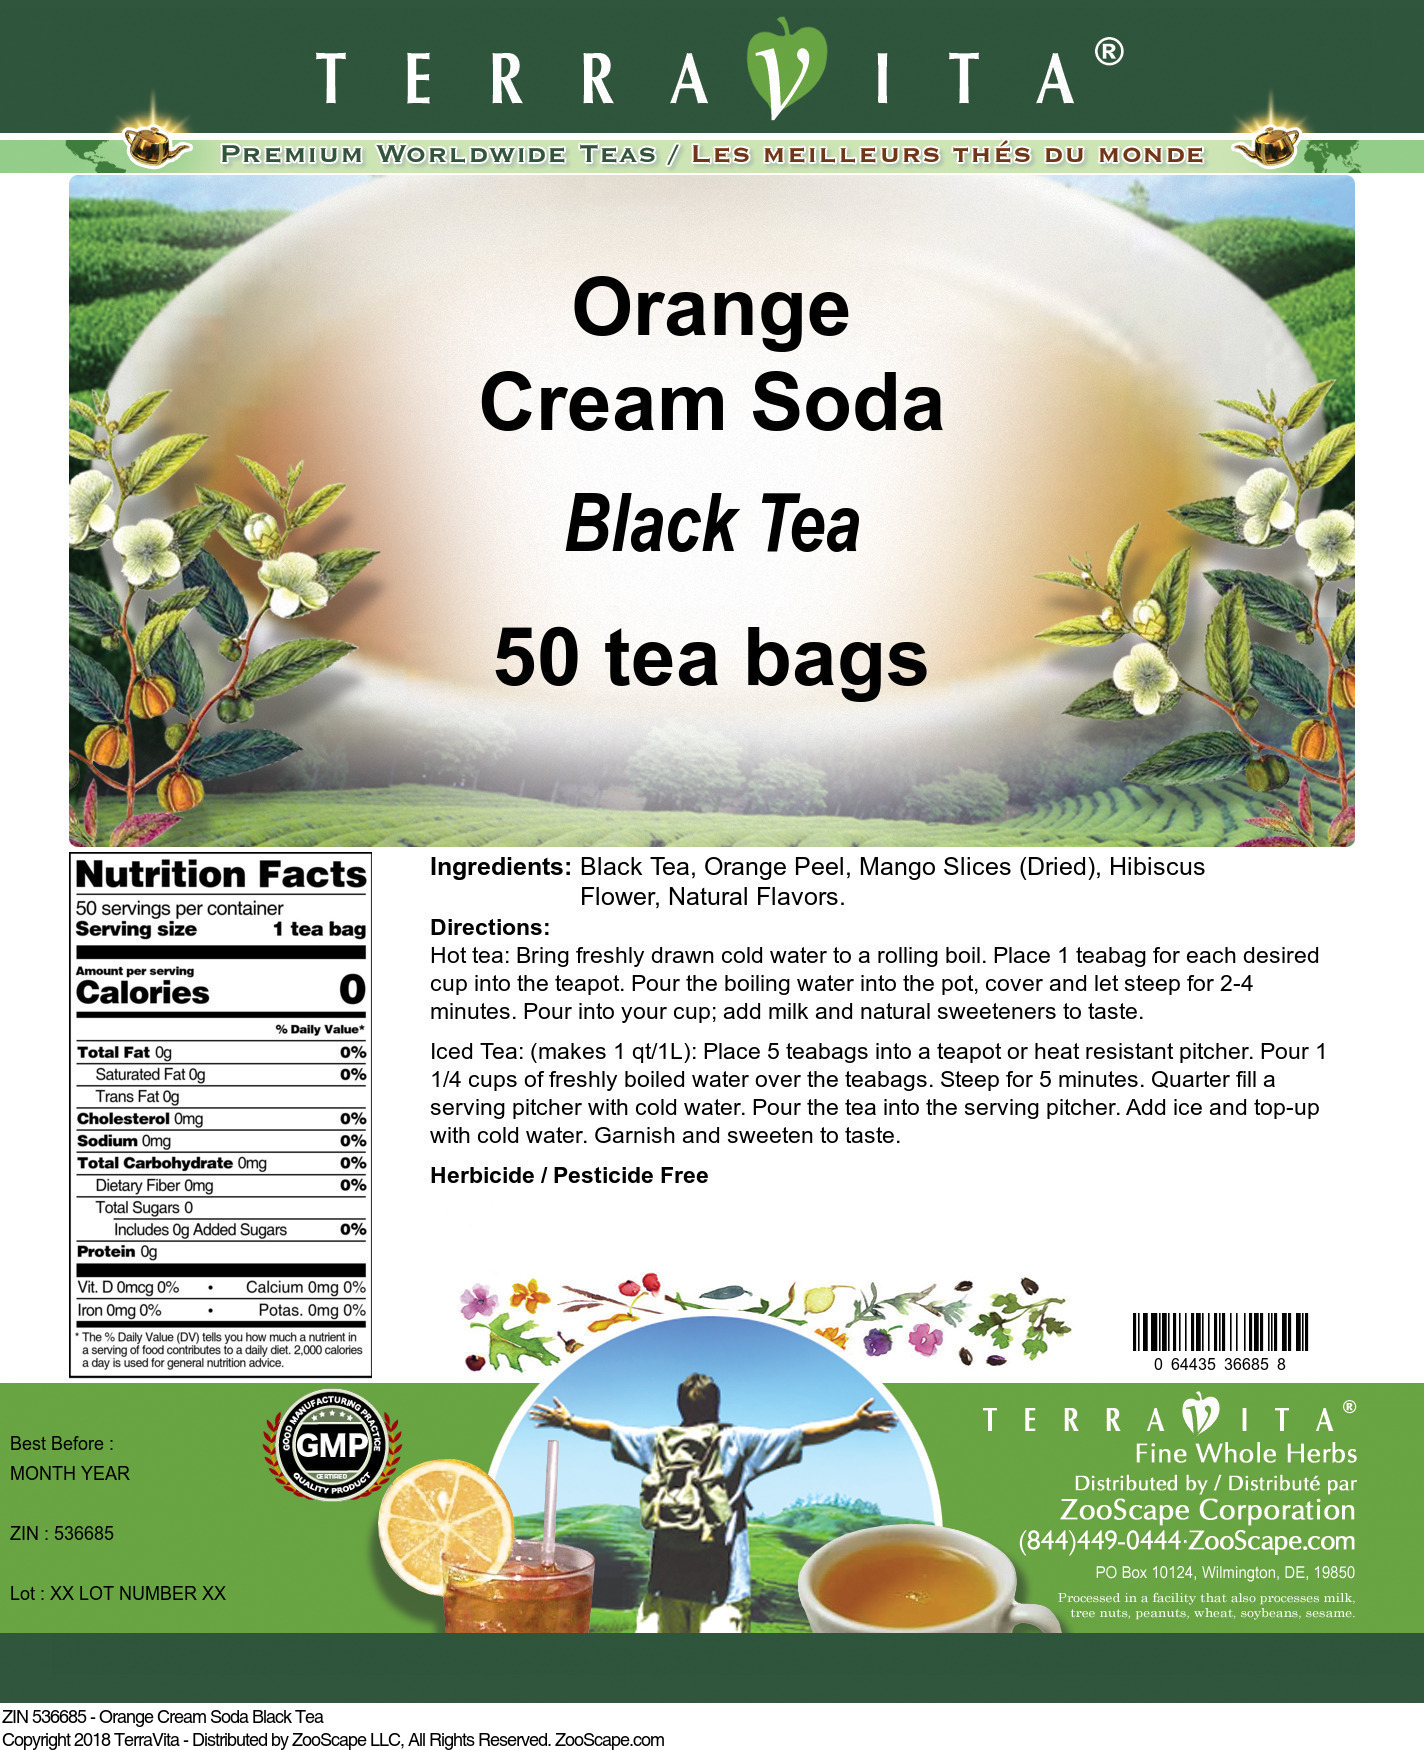 Orange Cream Soda Black Tea